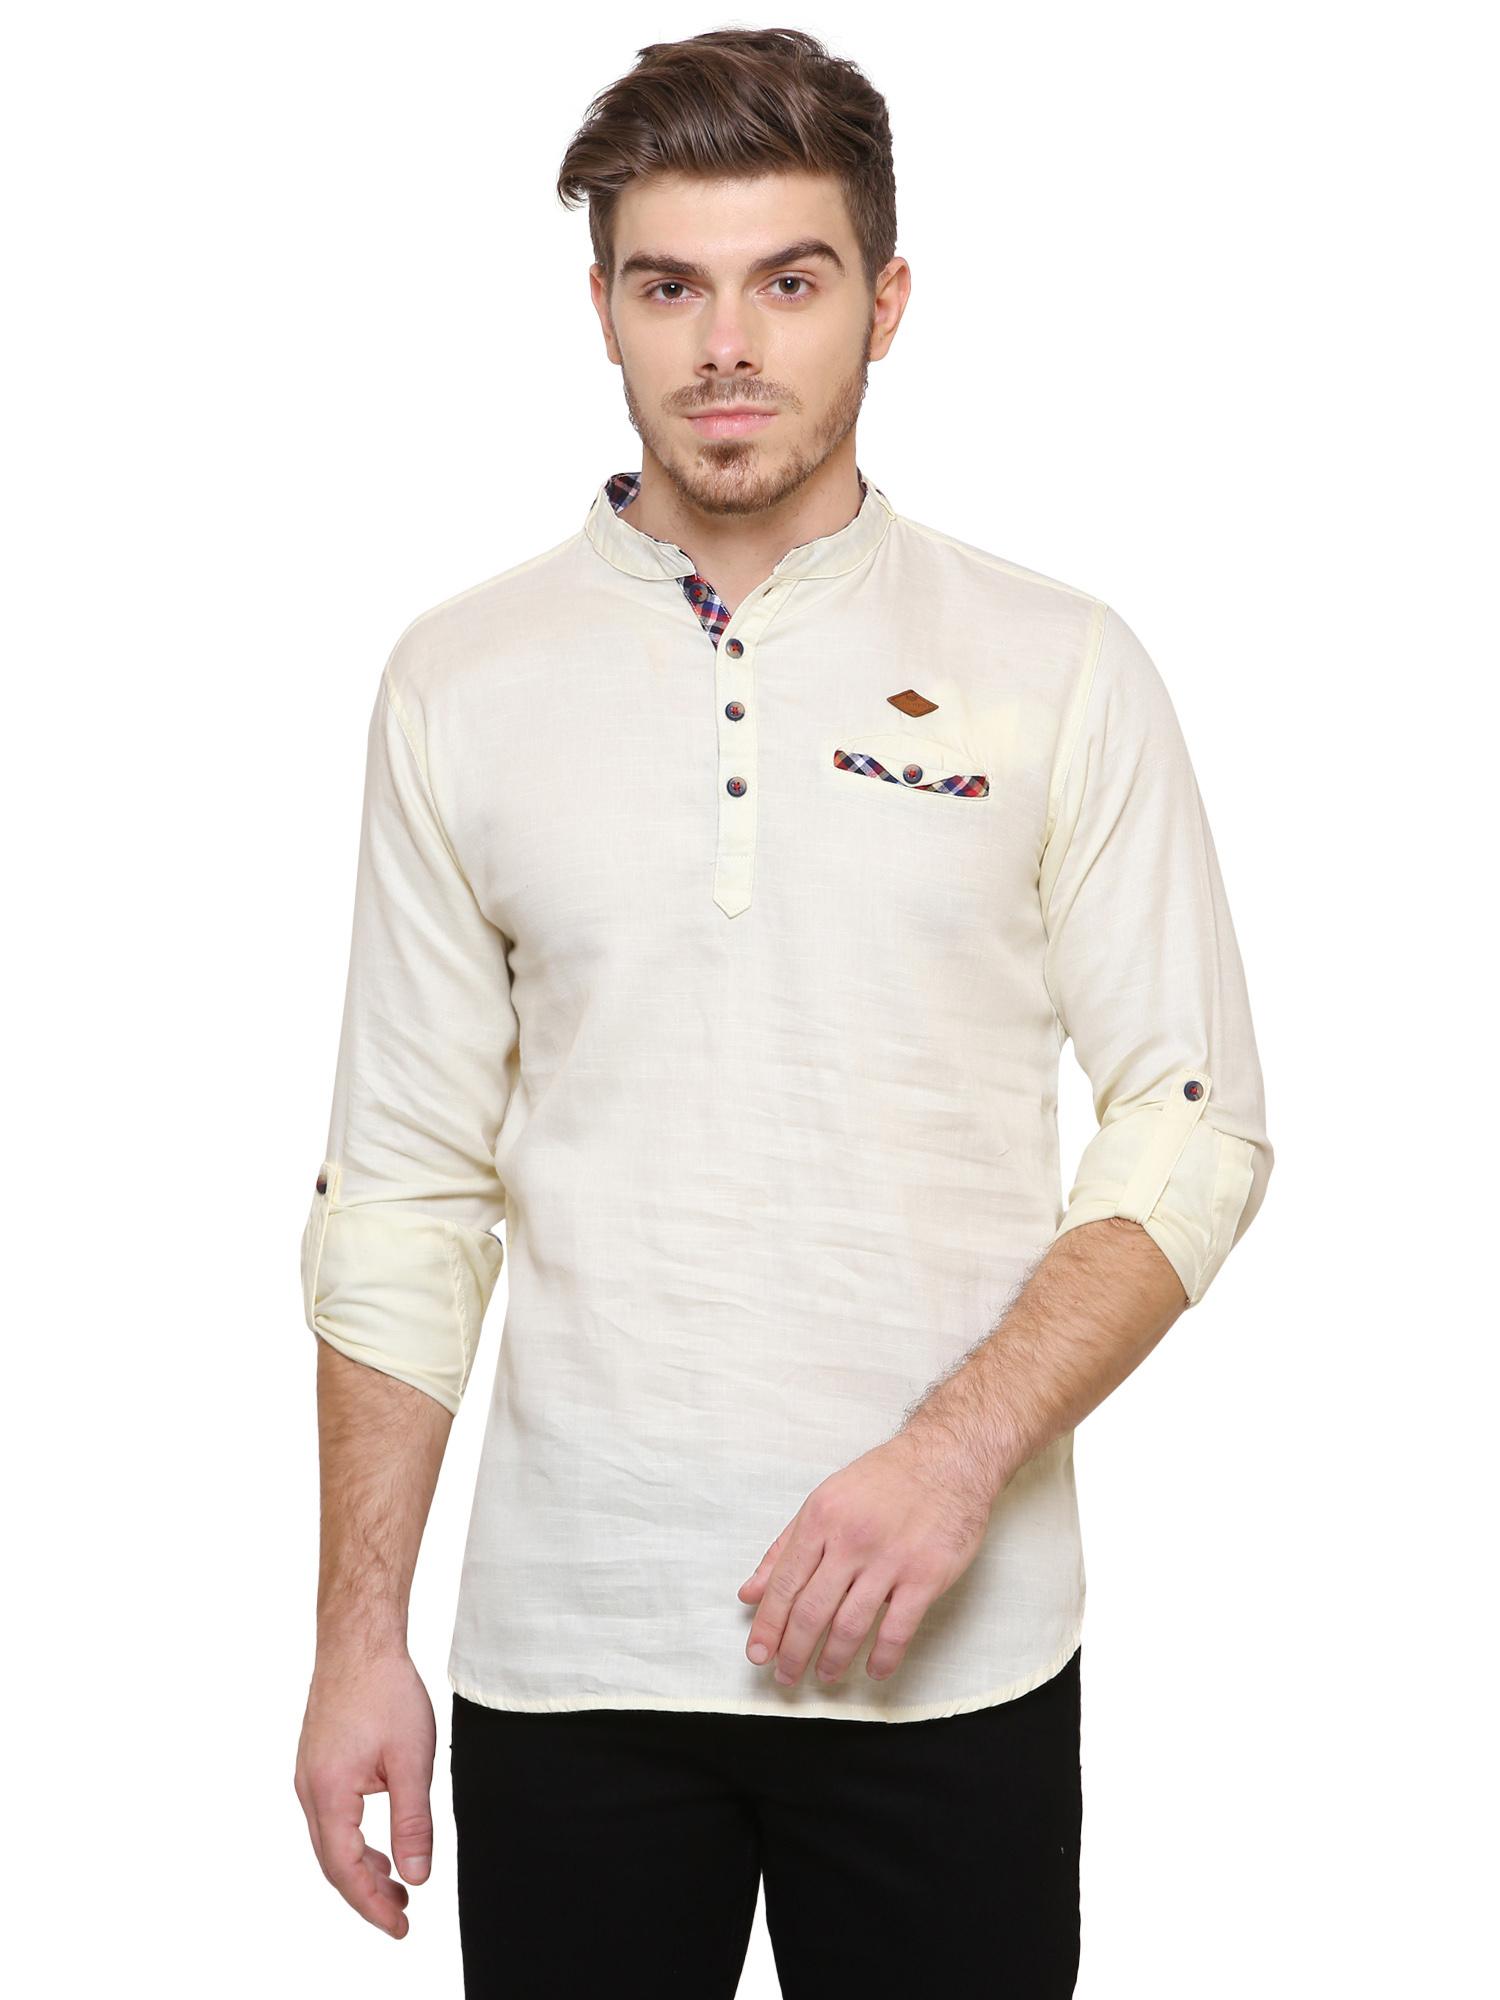 Kuons Avenue | Kuons Avenue Men's Cream Yellow Casual Cotton Kurta- KACLFS1260YL